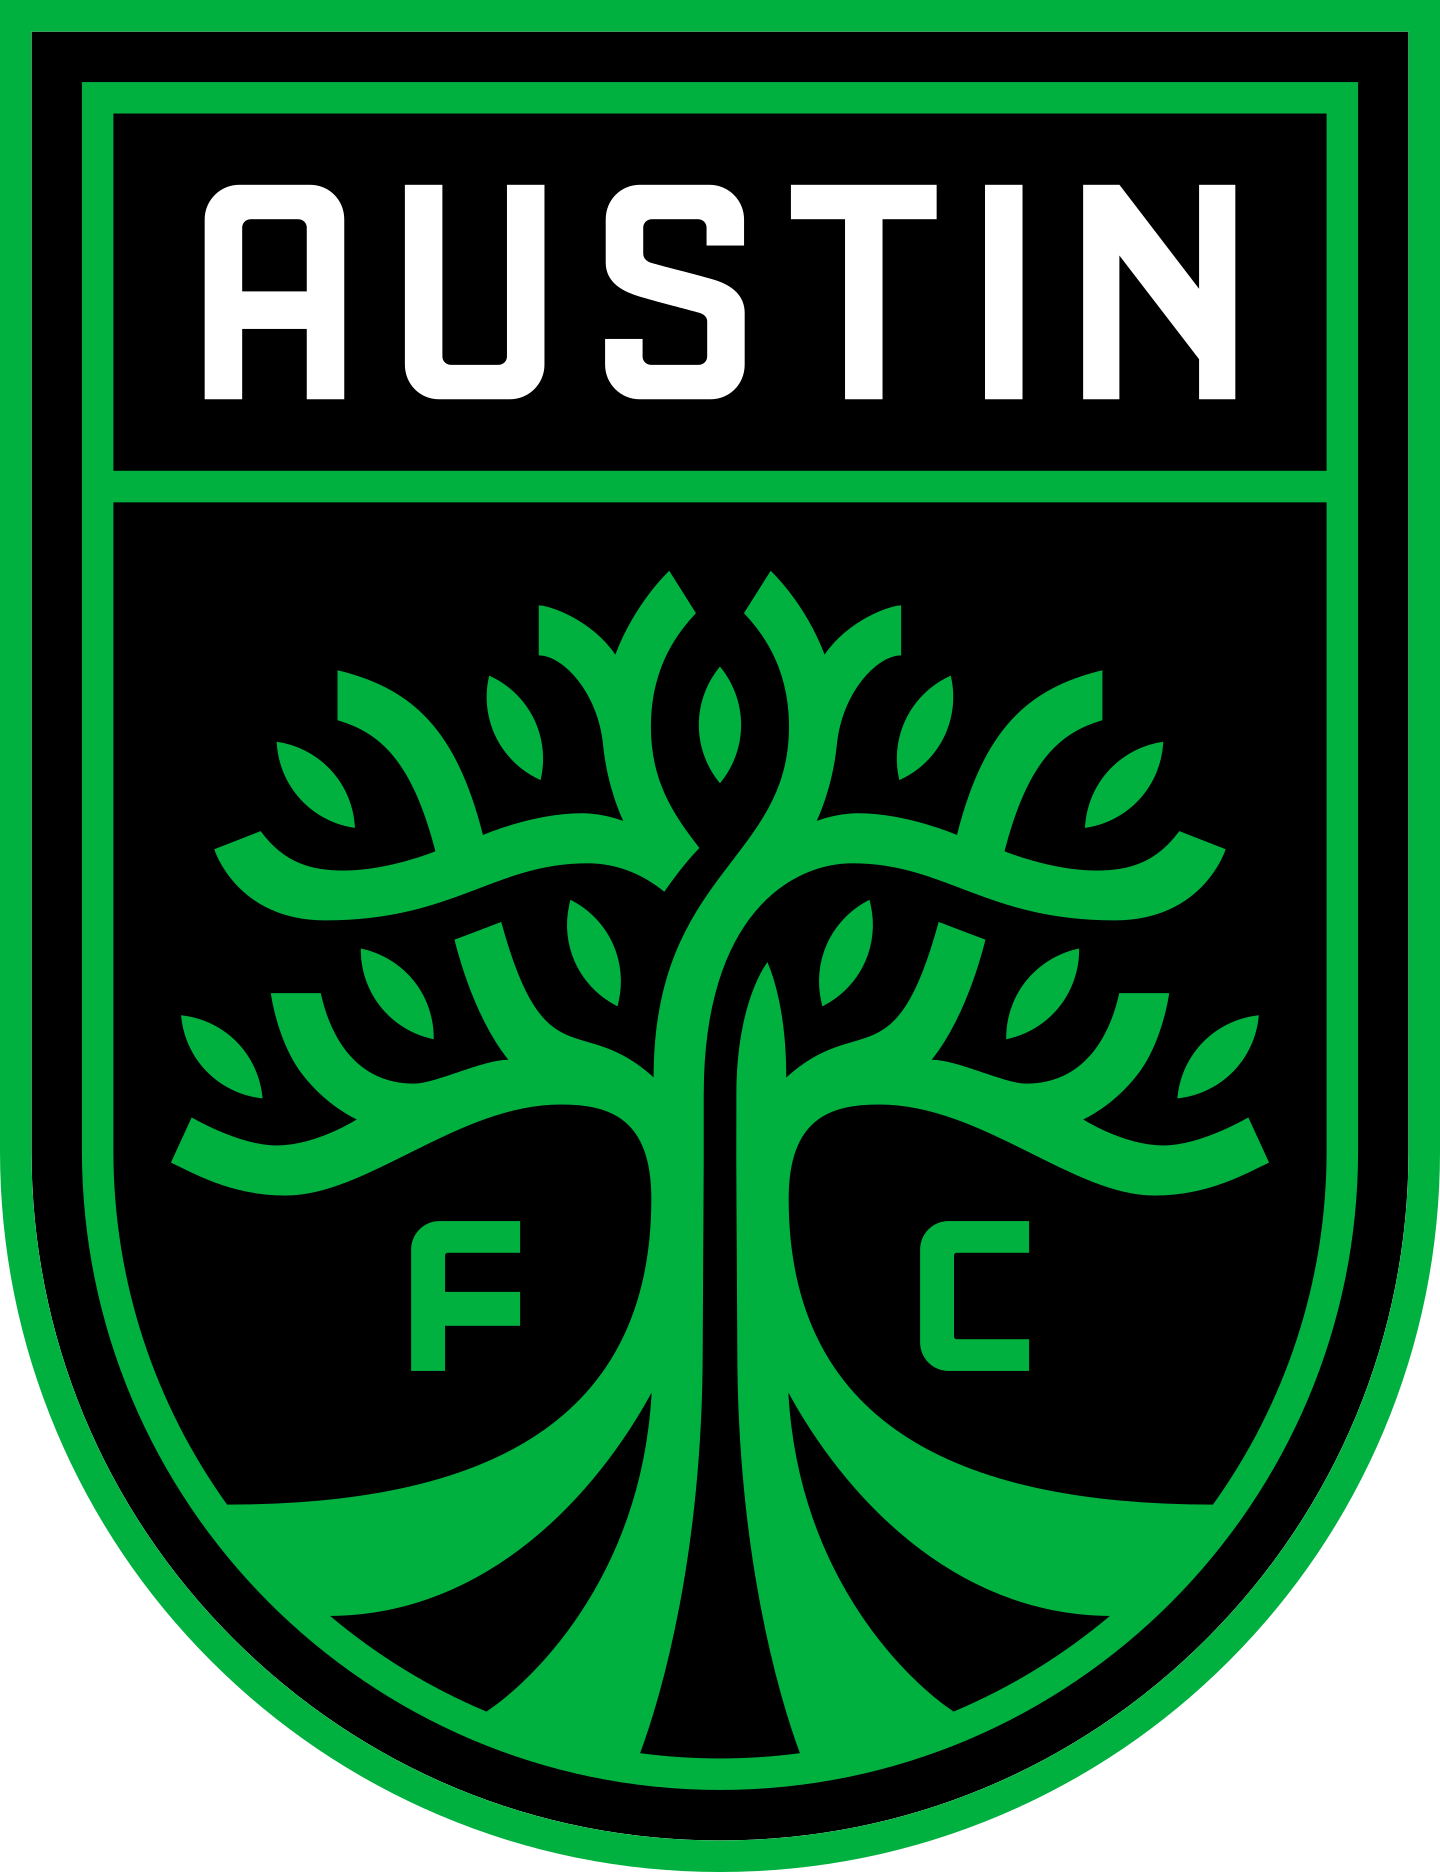 austin fc logo 2 - Austin FC Logo